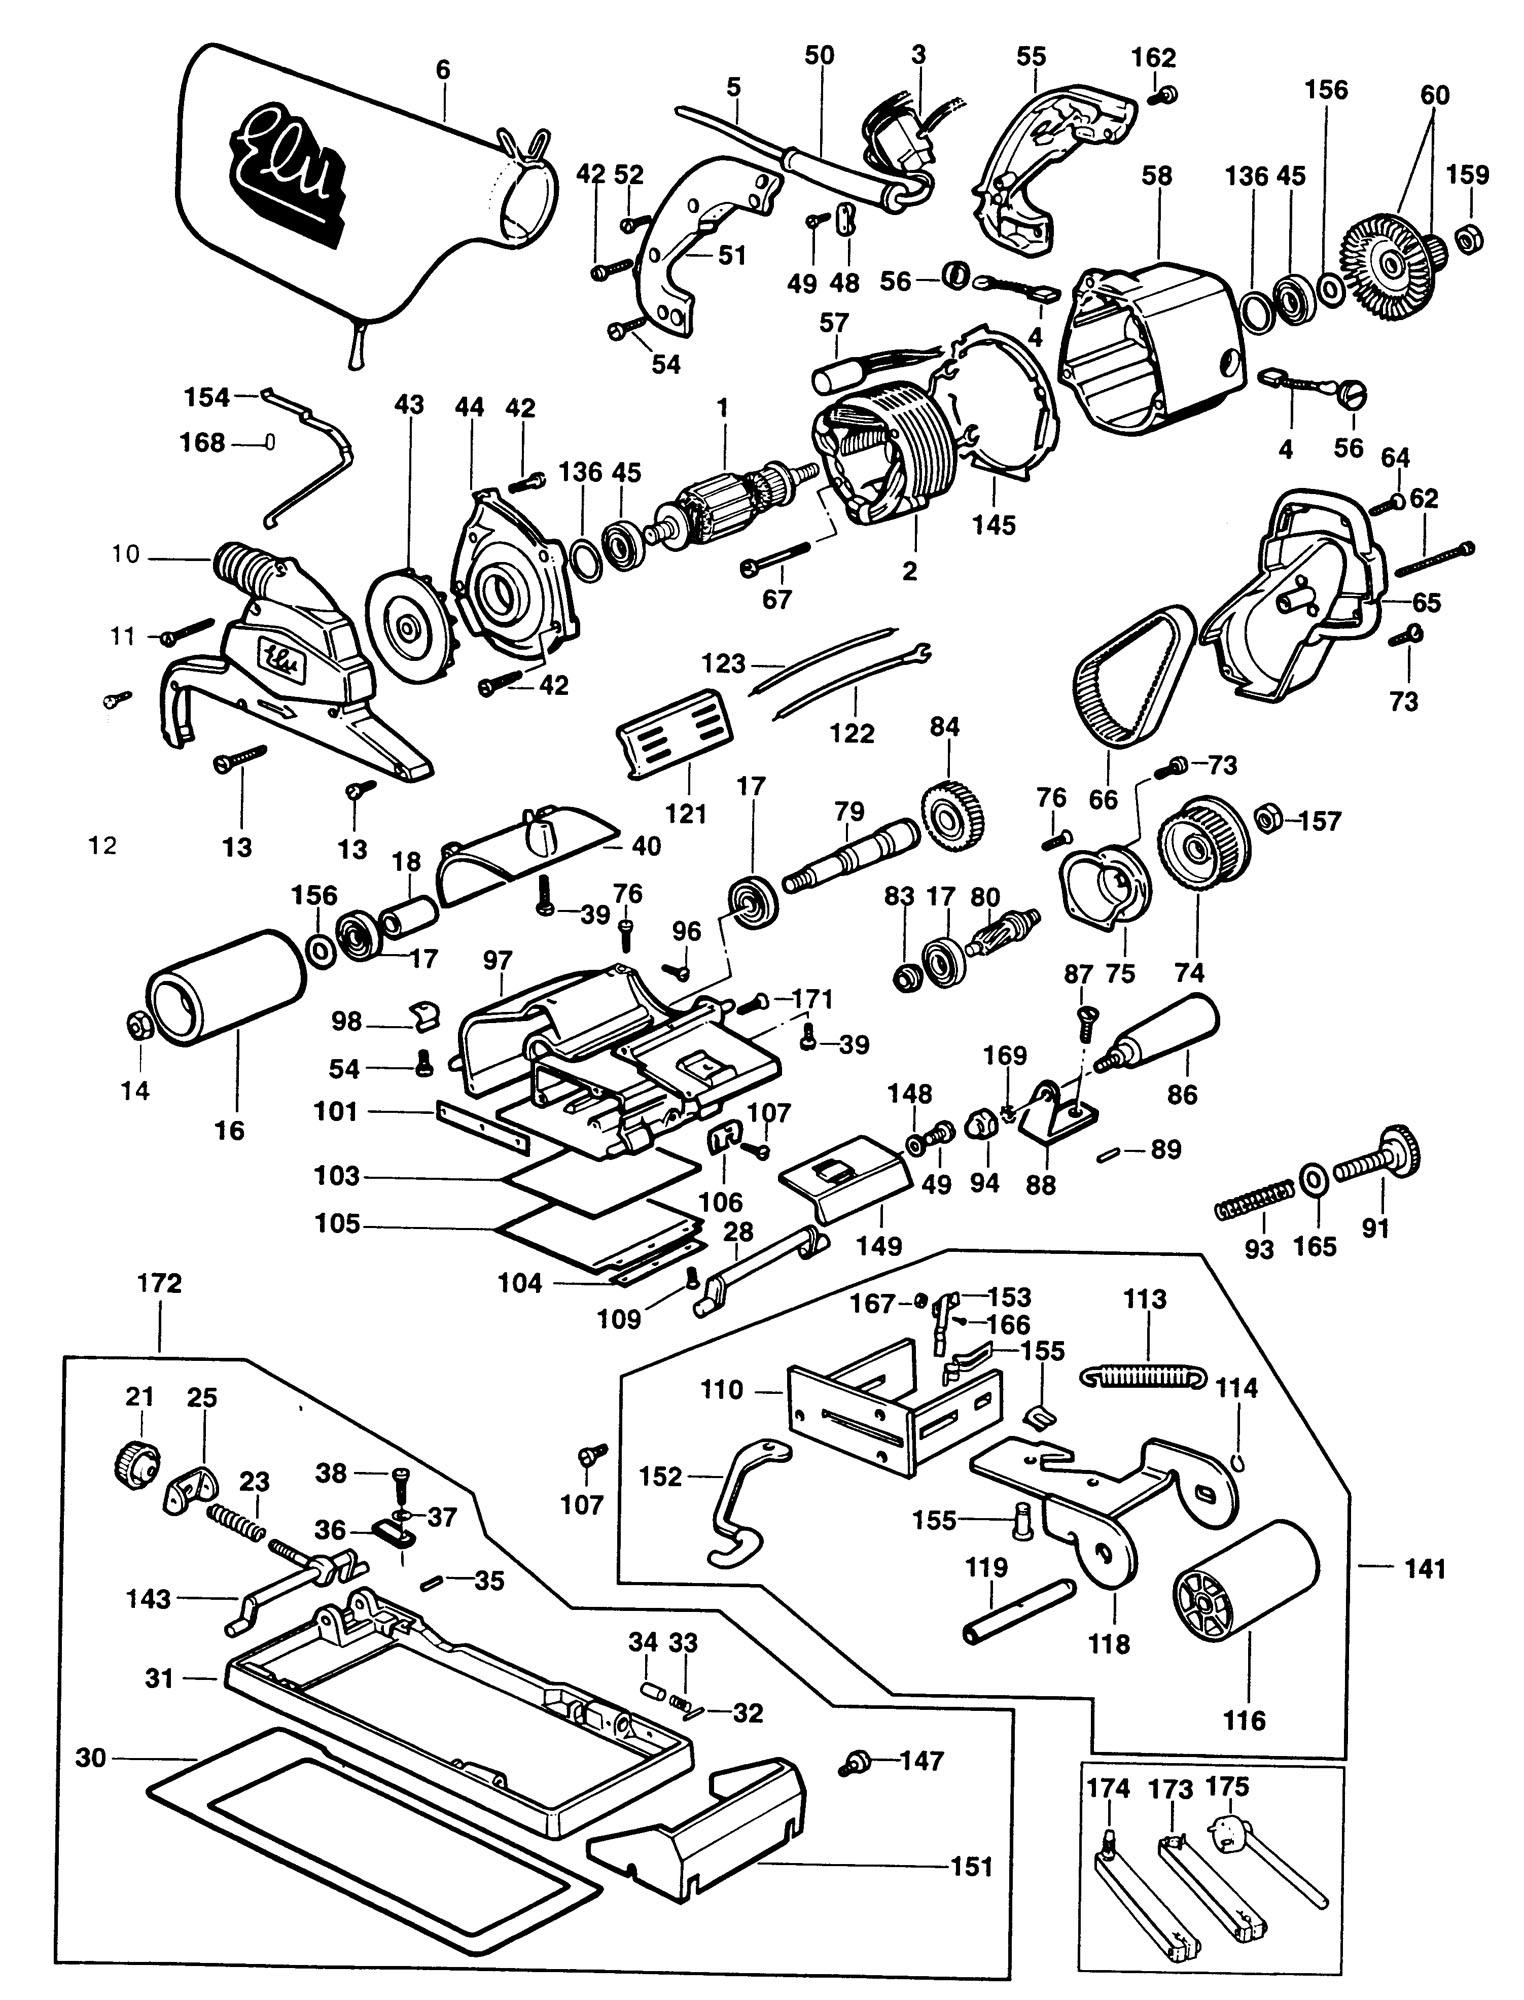 Spares For Elu Mhb90 Belt Sander Type 4 Spare Mhb90 Type